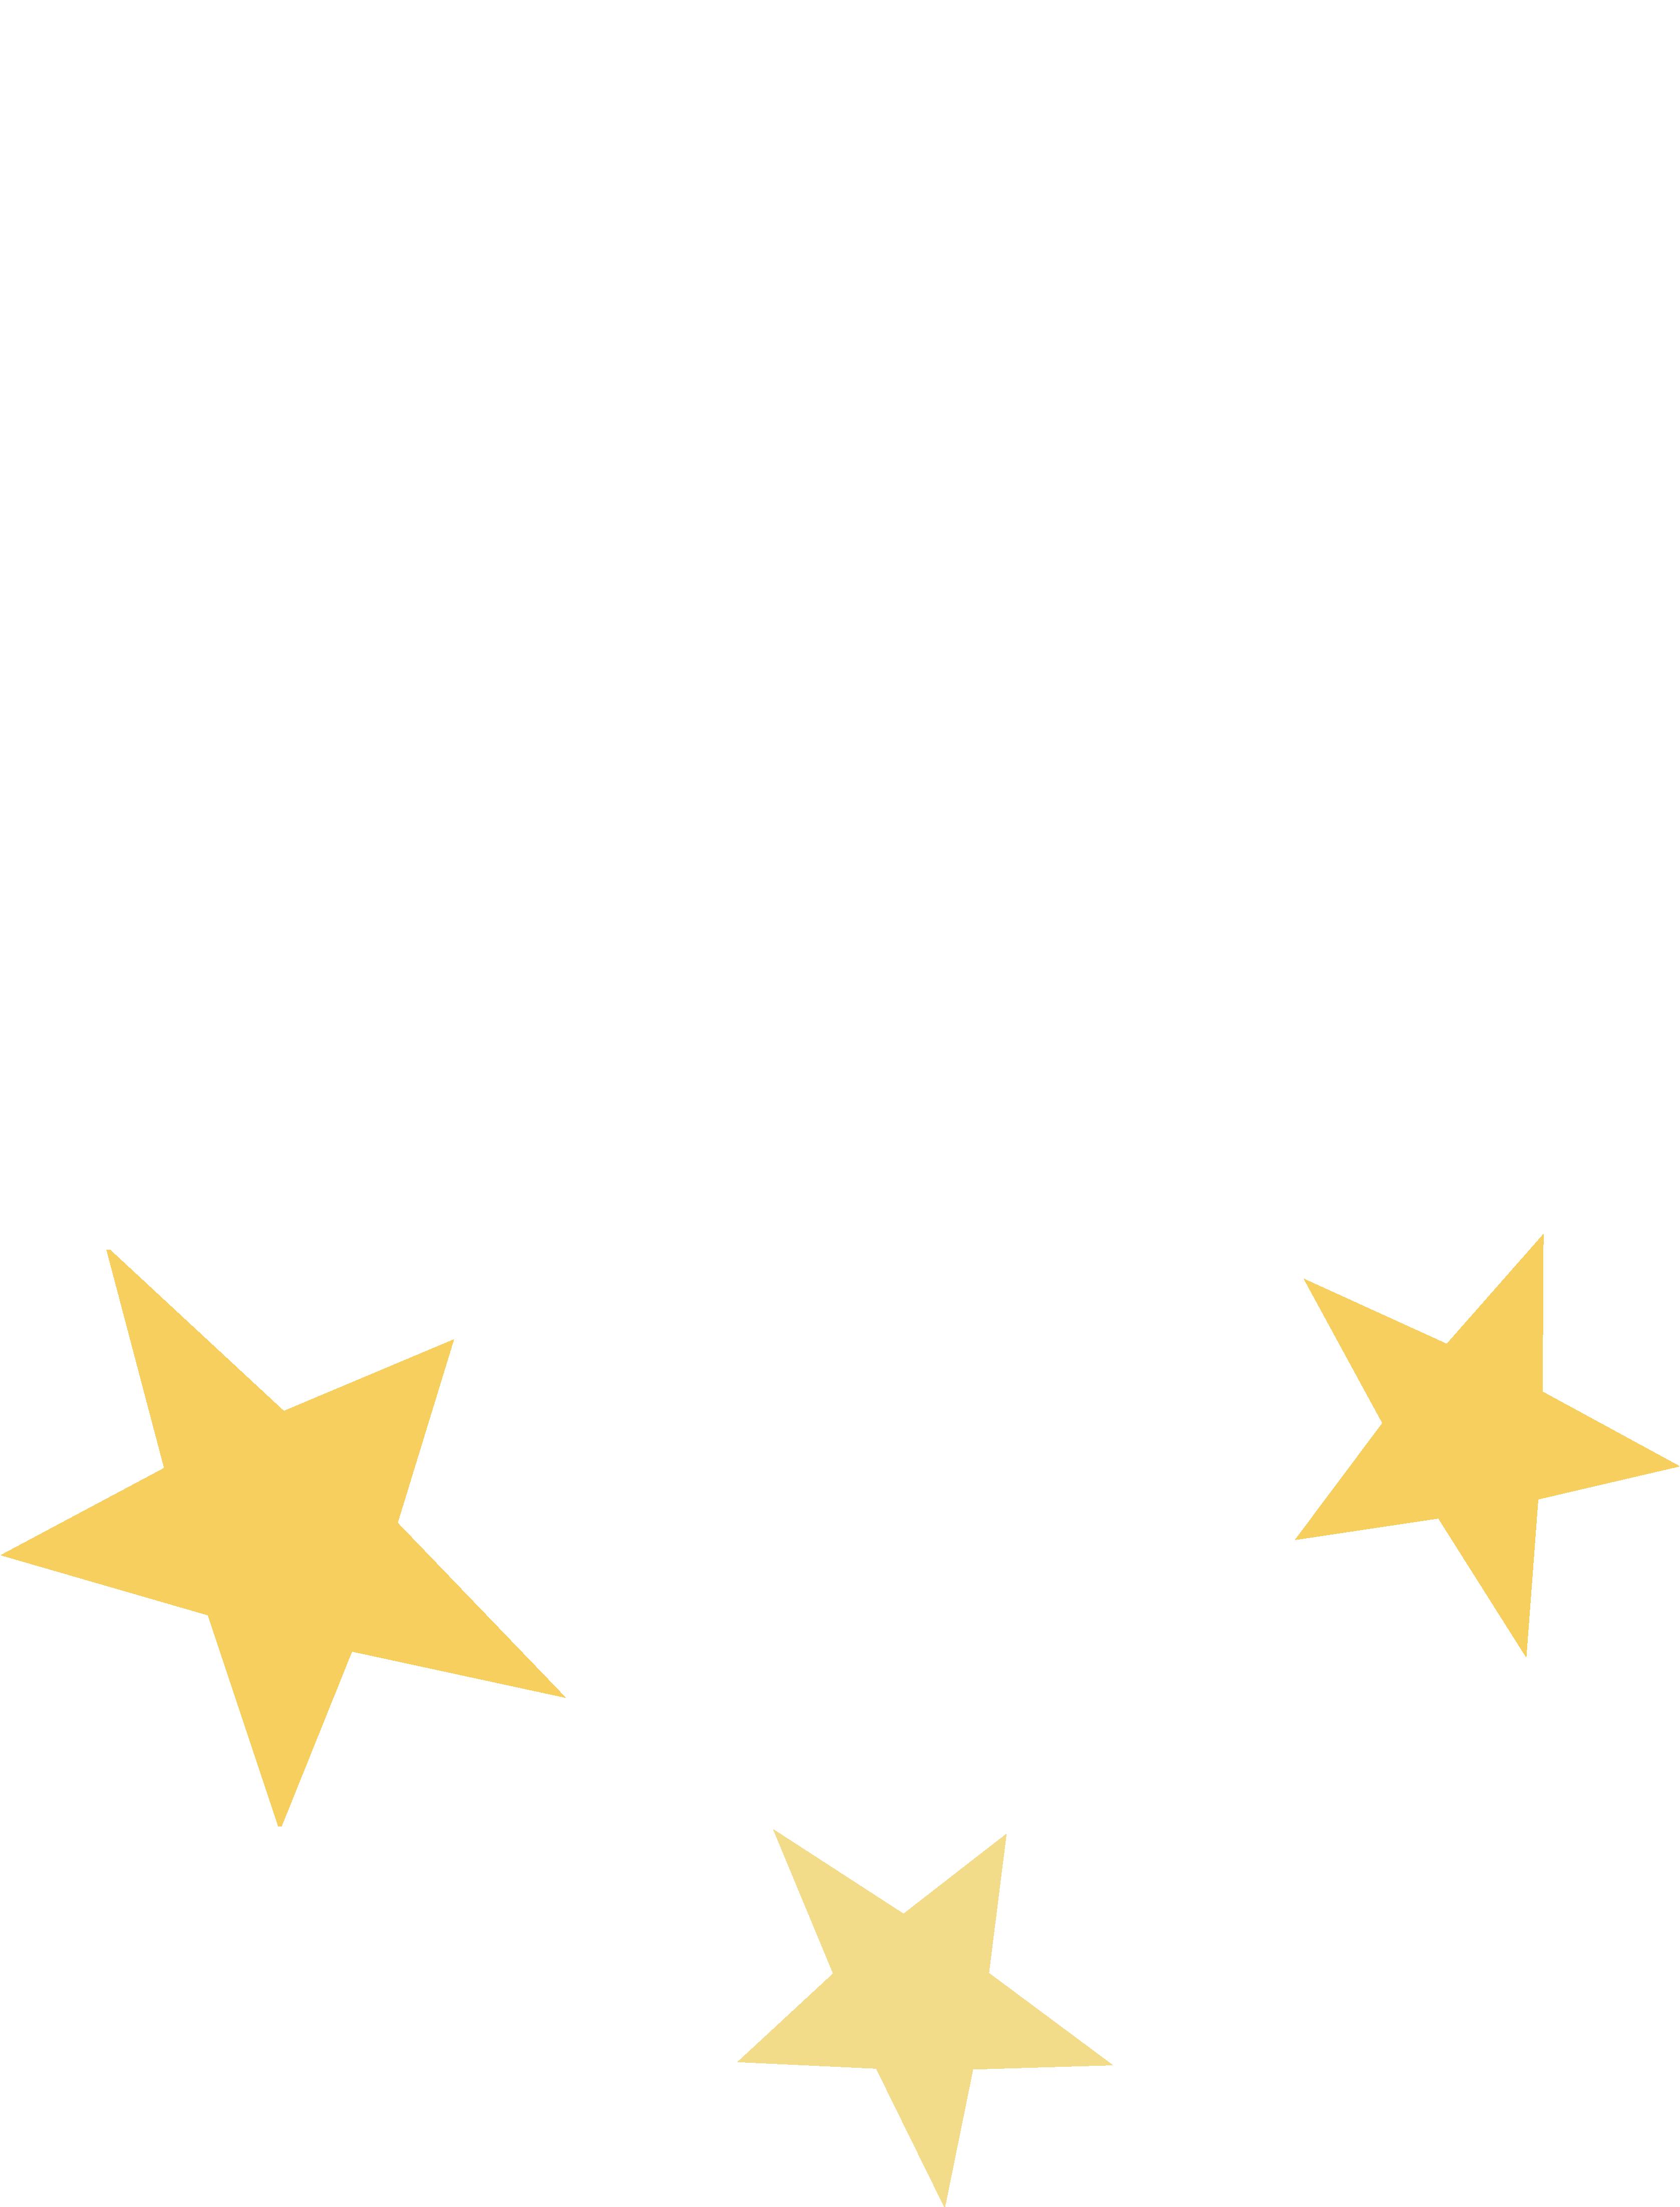 Lightning Dust cutie mark by blueblitzie